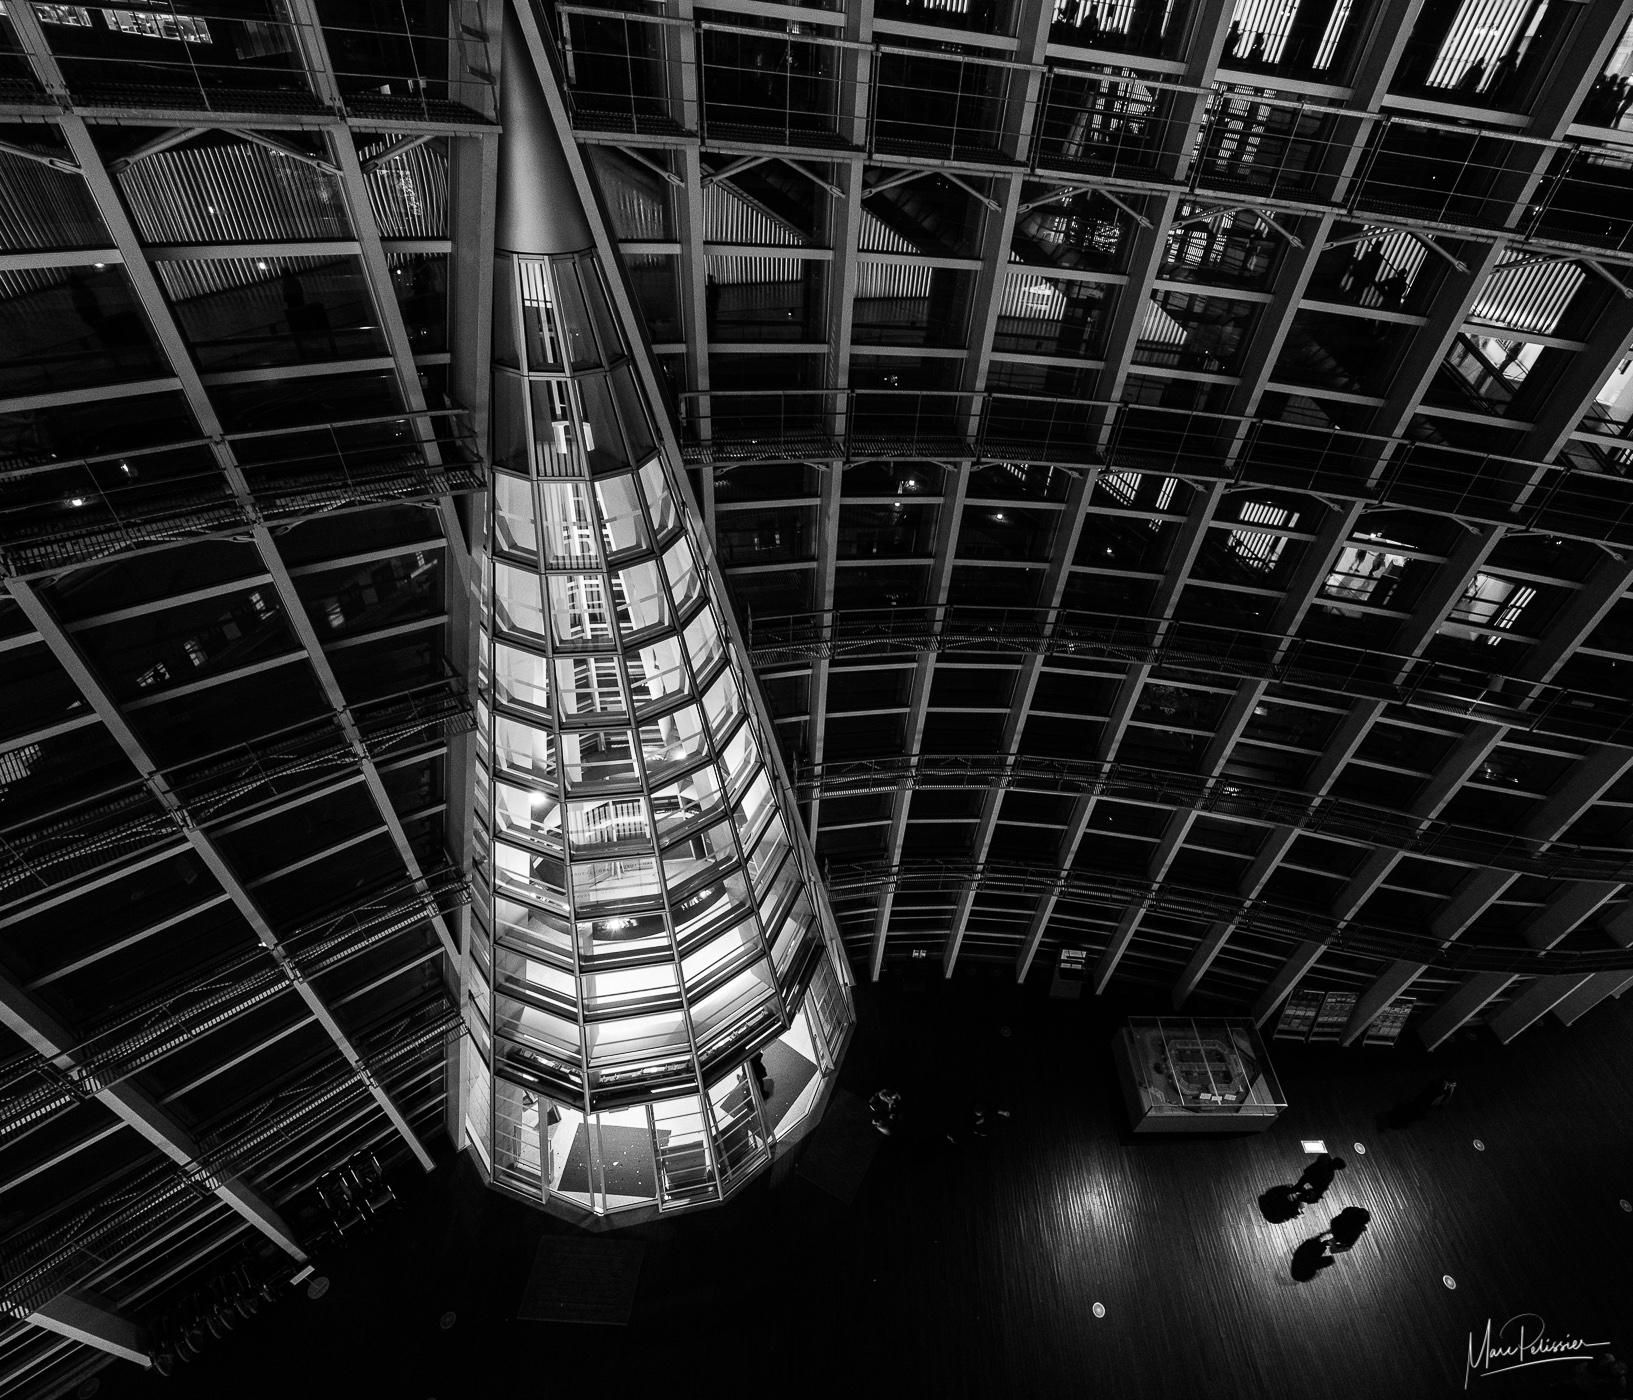 National art center peak architecture, Japan